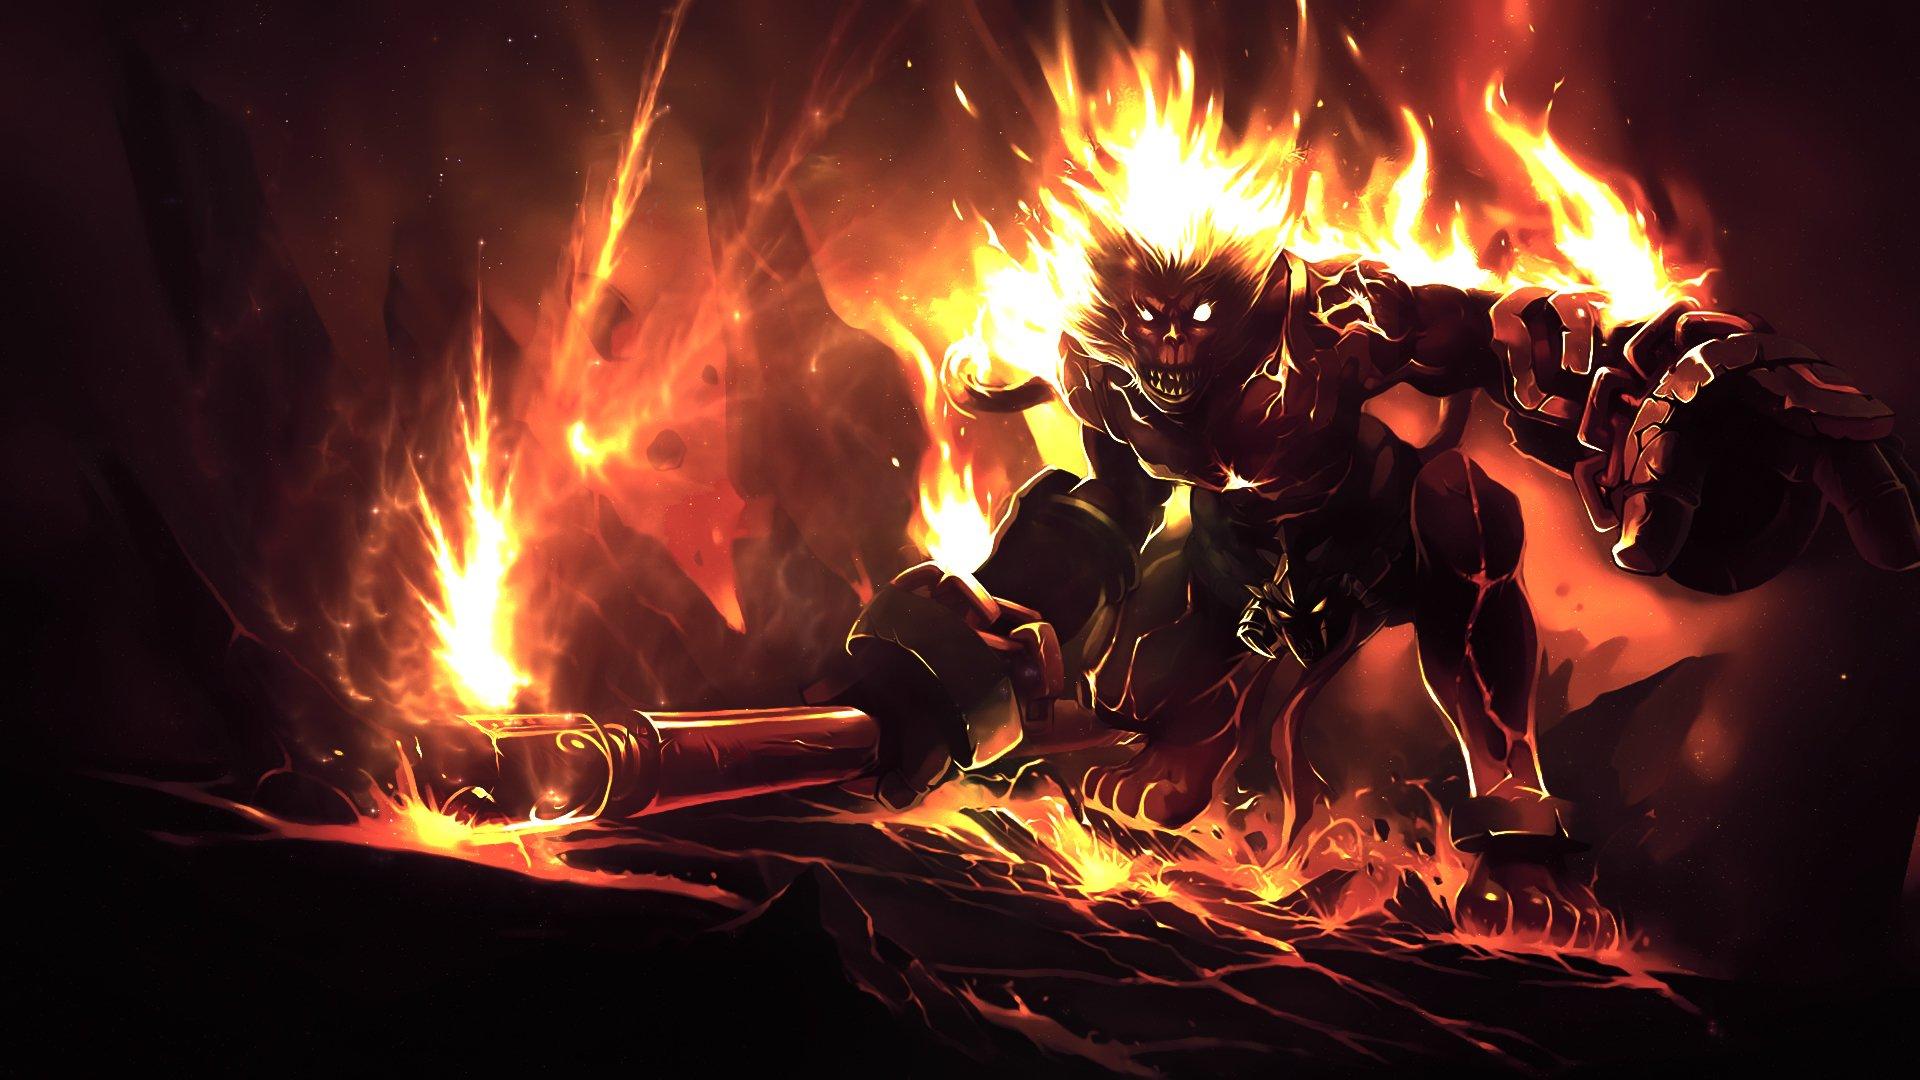 Video Game - League Of Legends  Wukong (League Of Legends) Wallpaper